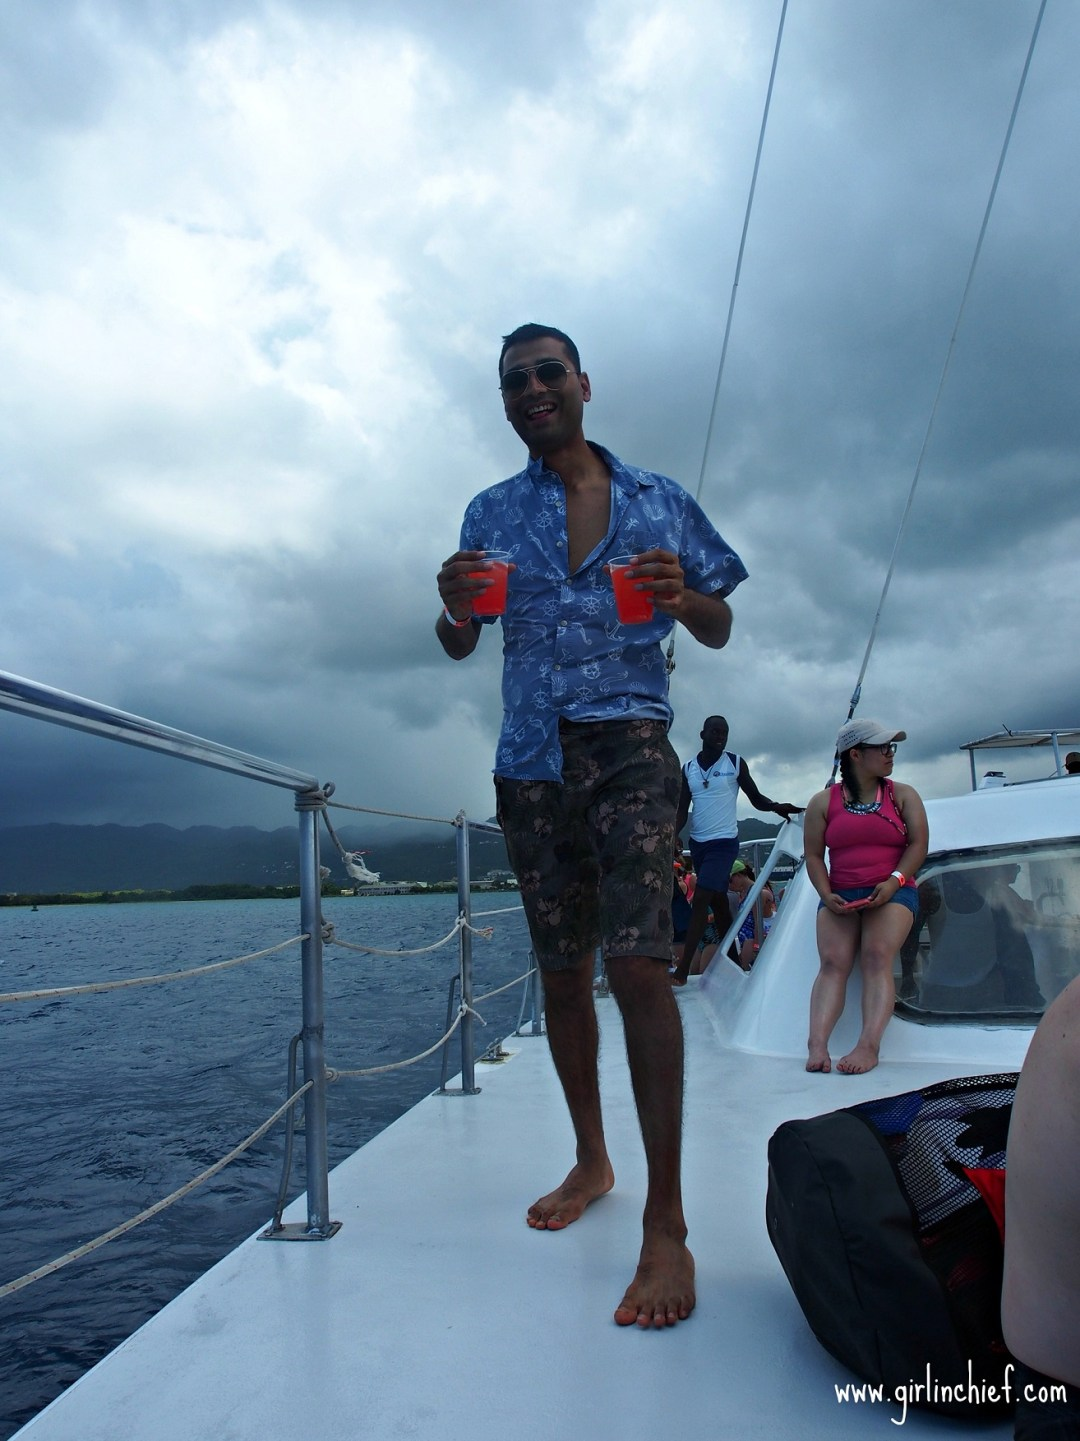 montego-bay-jamaica-catamaran-snorkel-rum-punch-carnival-freedom